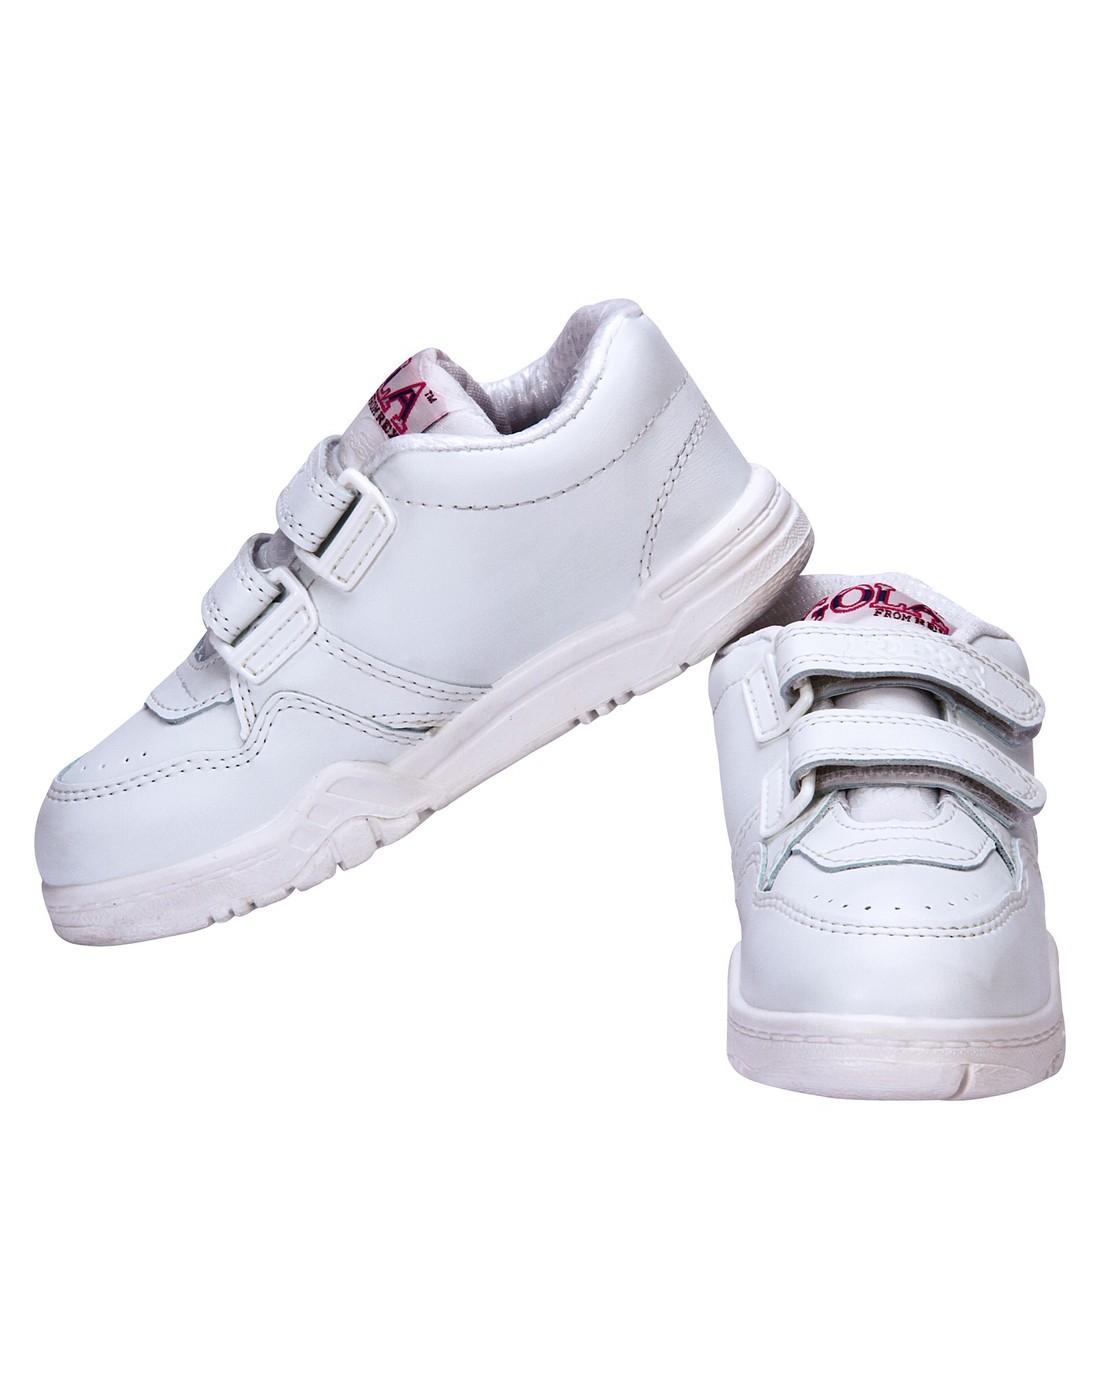 Rex Gola White Shoes